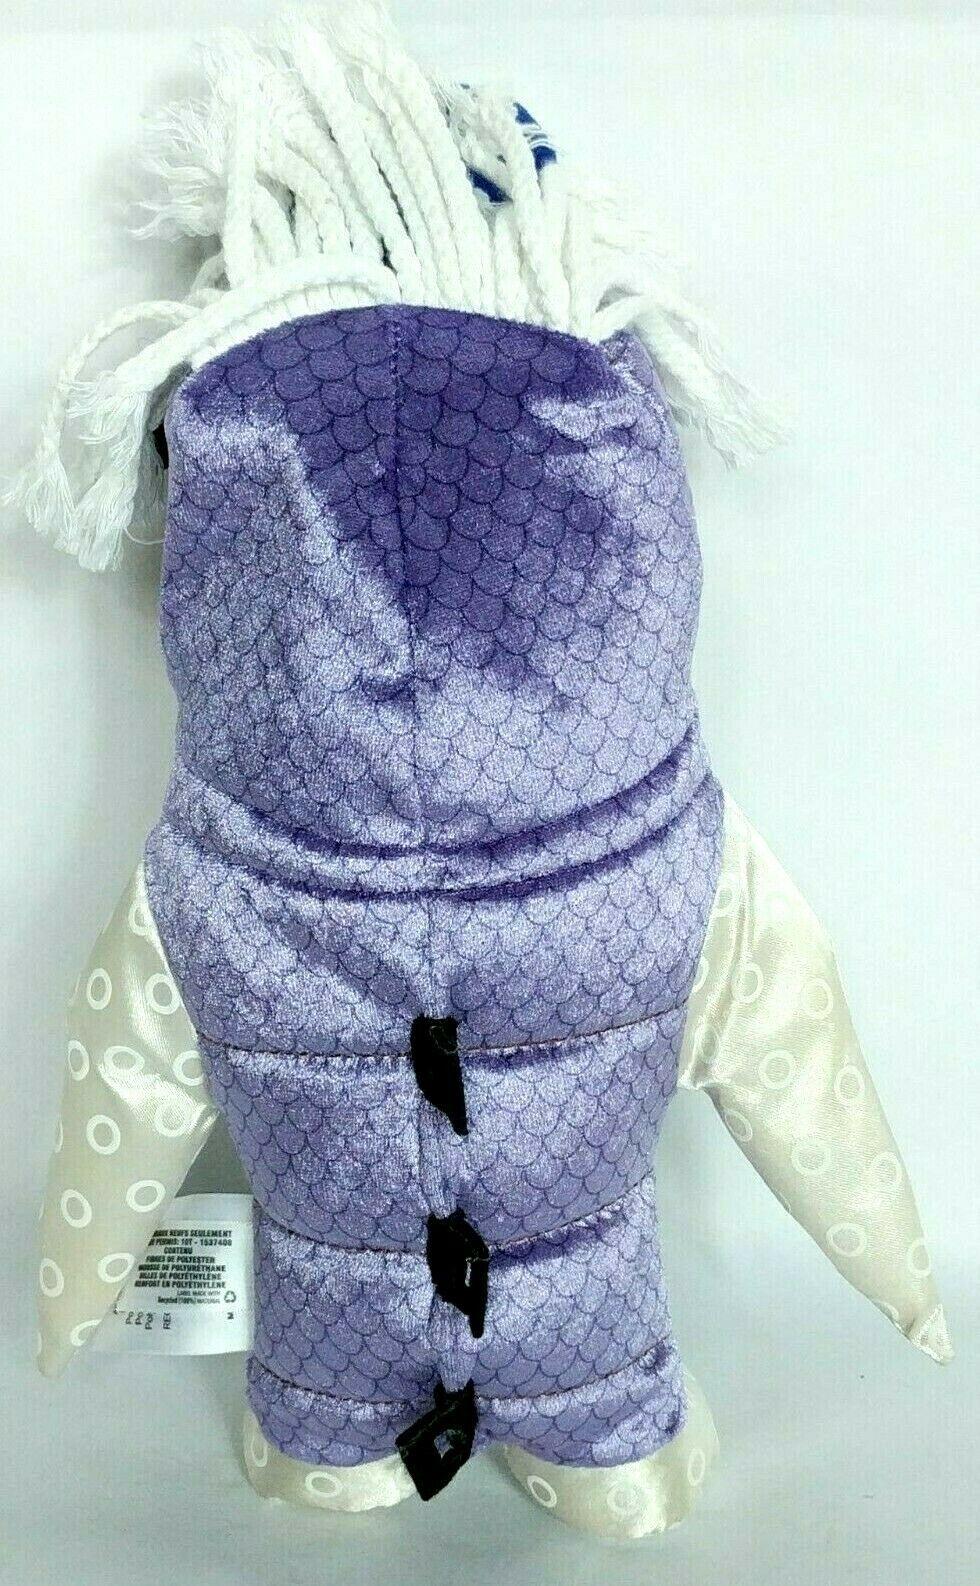 "Disney Store Pixar Monsters Inc Boo In Costume Plush Stuffed Animal 15"" image 2"